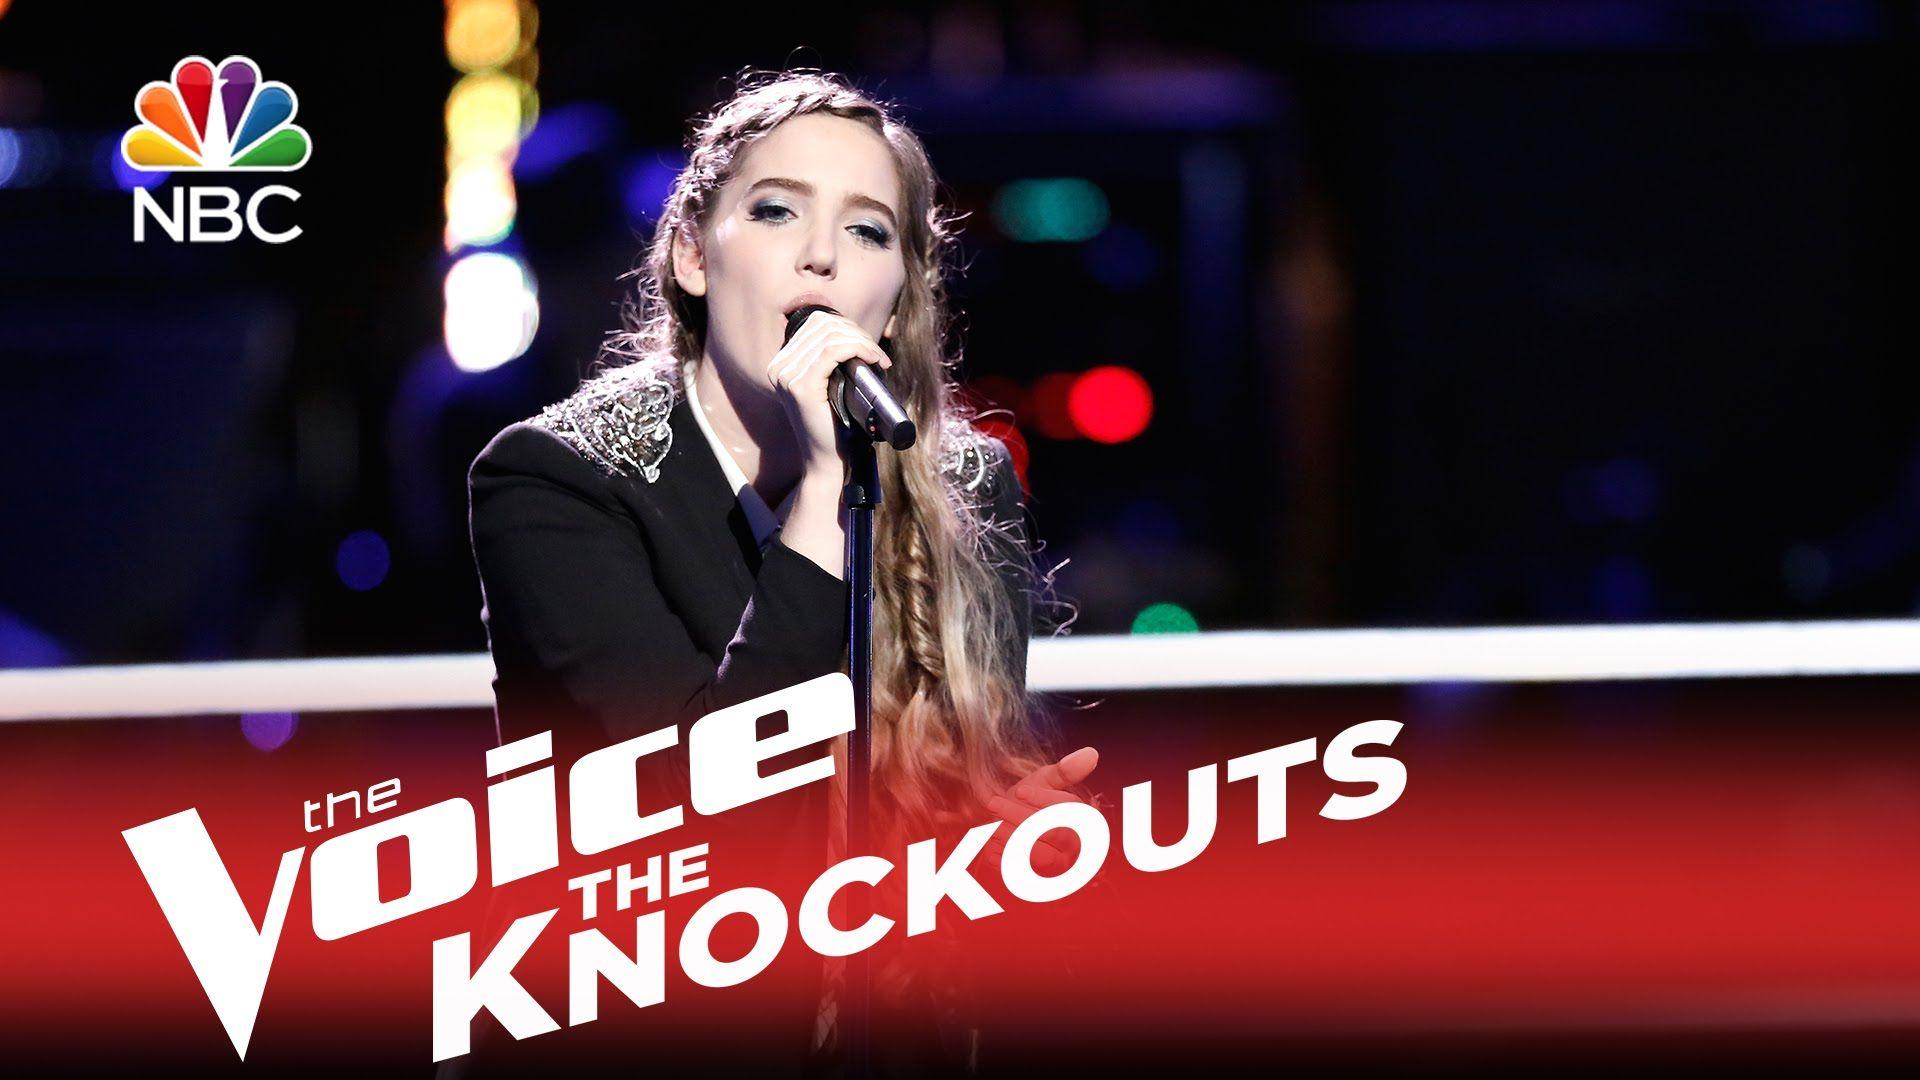 The Voice 2015 Knockout Korin Bukowski All I Want The Voice Tv Show The Voice 2015 Voice Singer